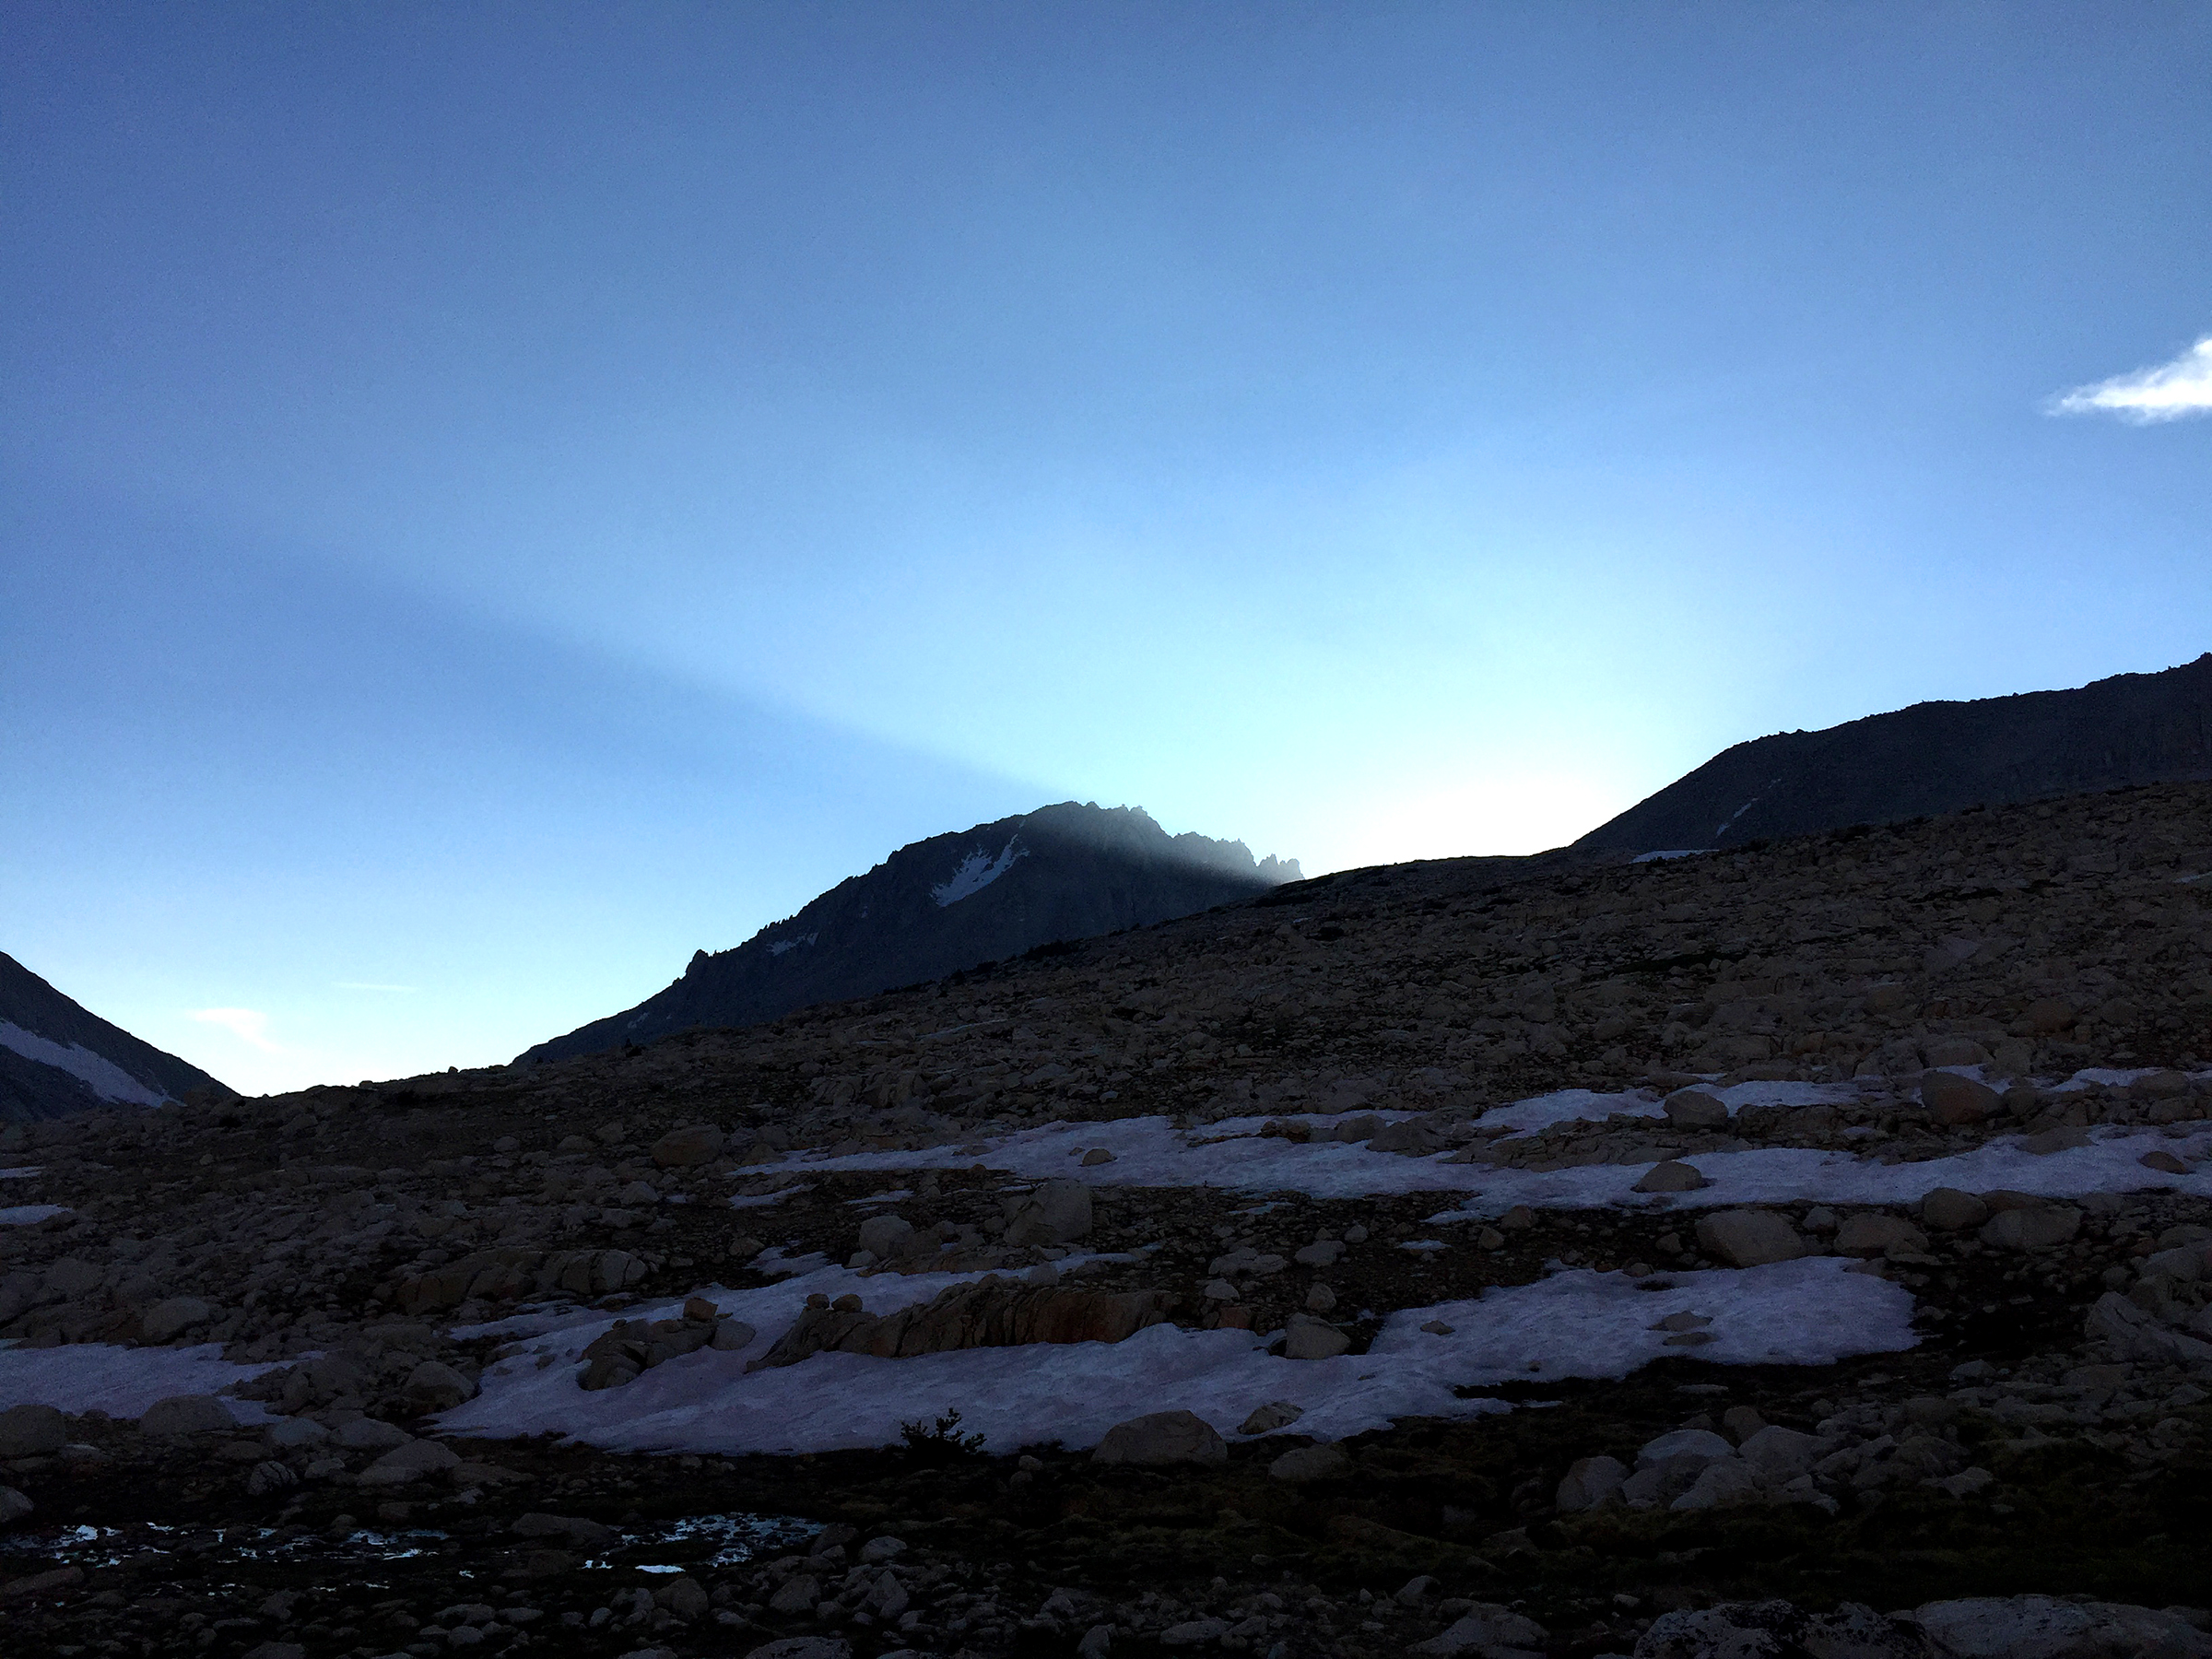 trailname-backstroke-sierra-high-route-2017_0747.jpg